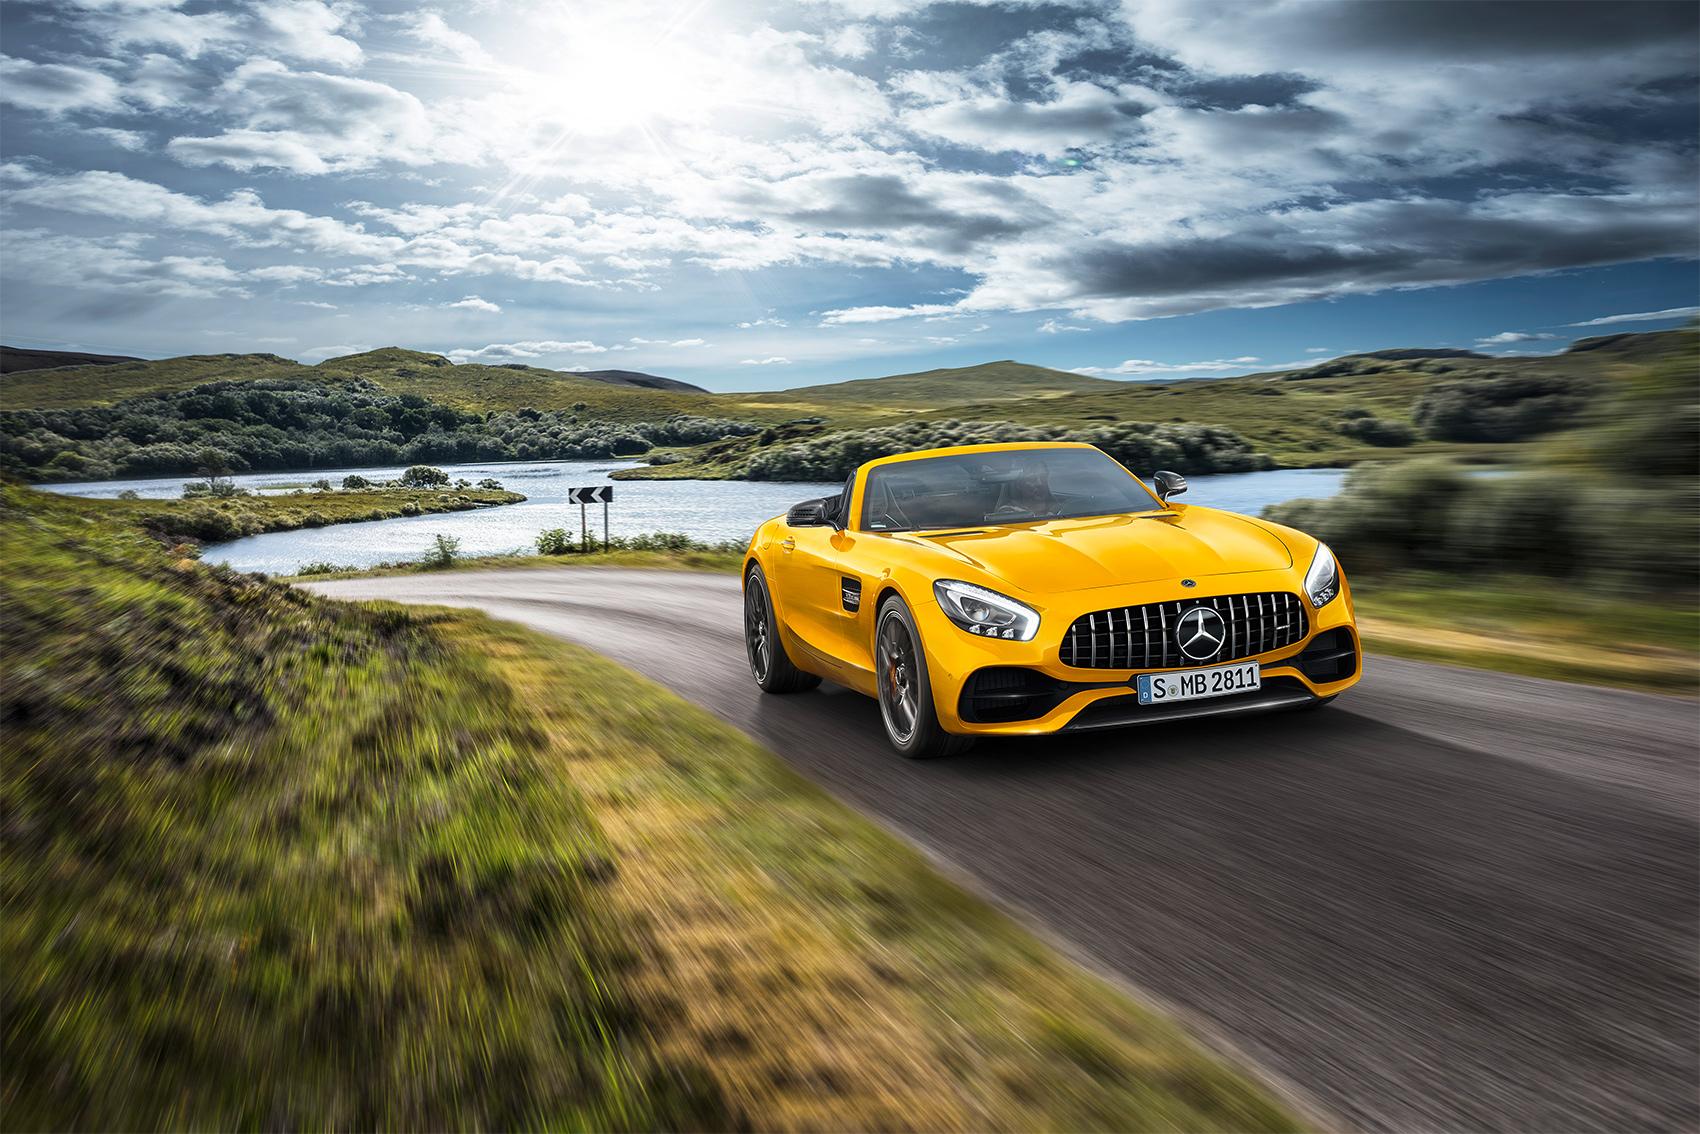 TrackWorthy - Mercedes-AMG GT S Roadster (1)